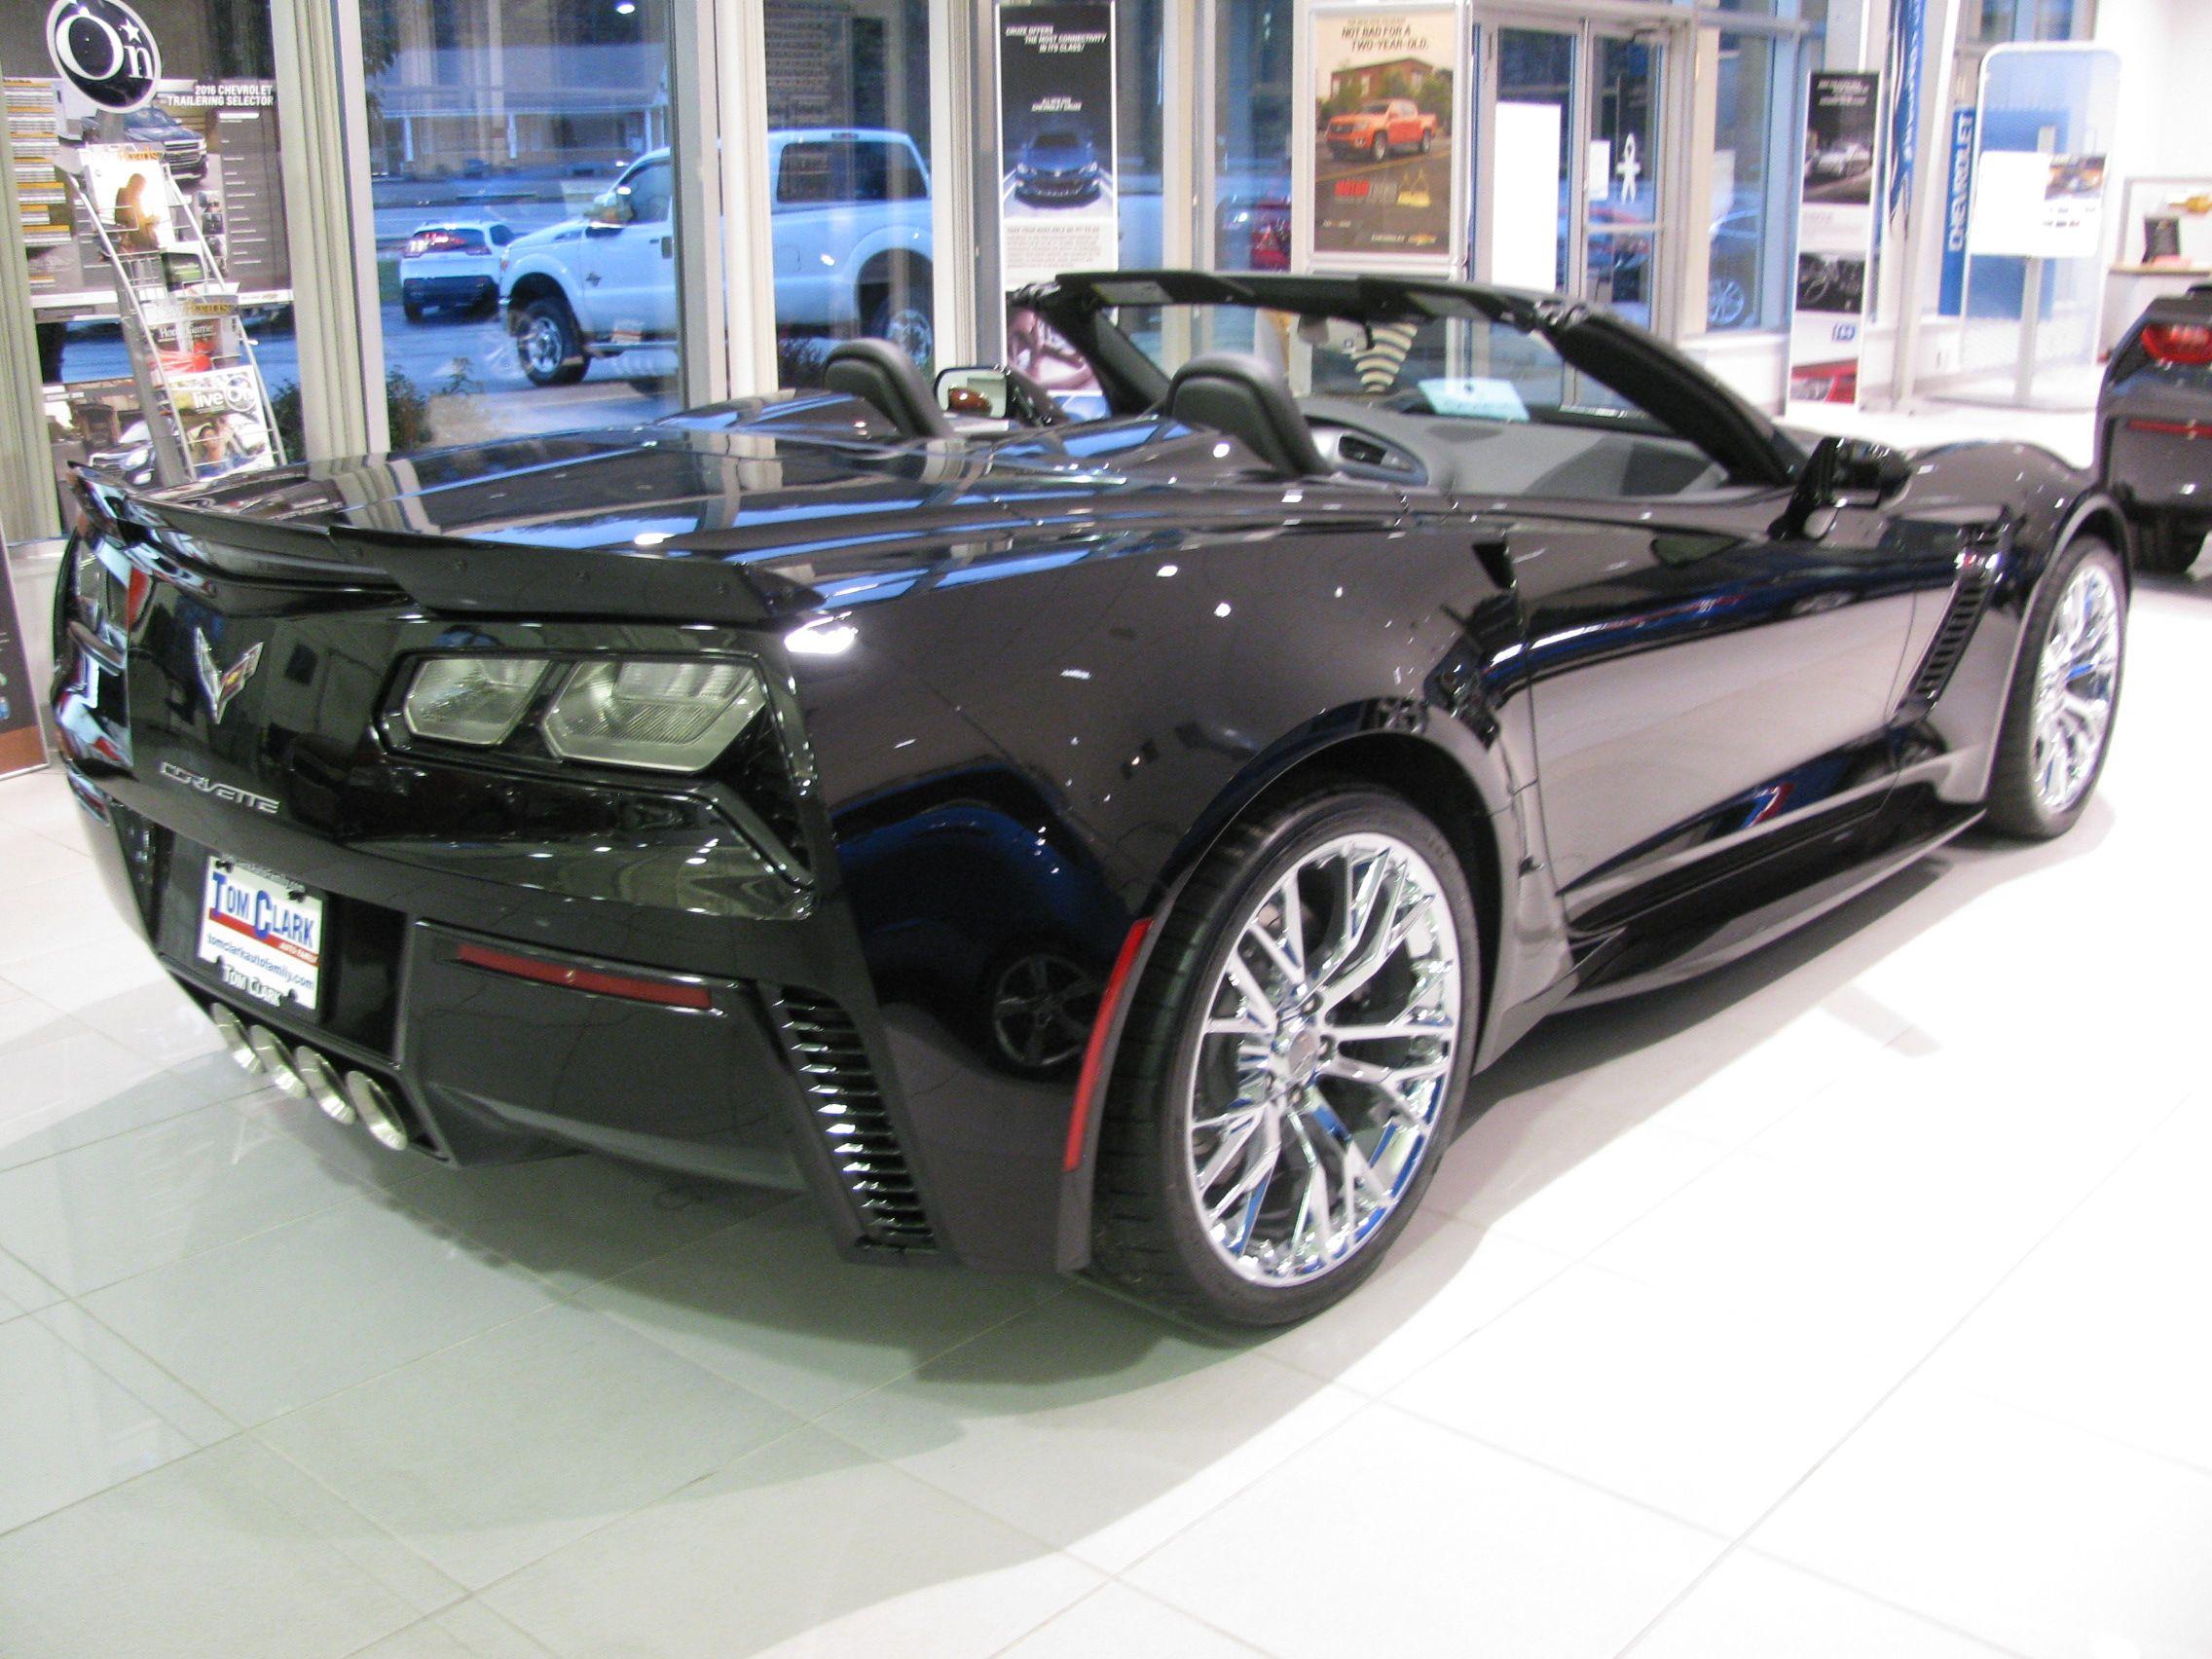 5 Year 60 000 Powertrain Limited Warranty Chevy Corvette Sports Car Convertible